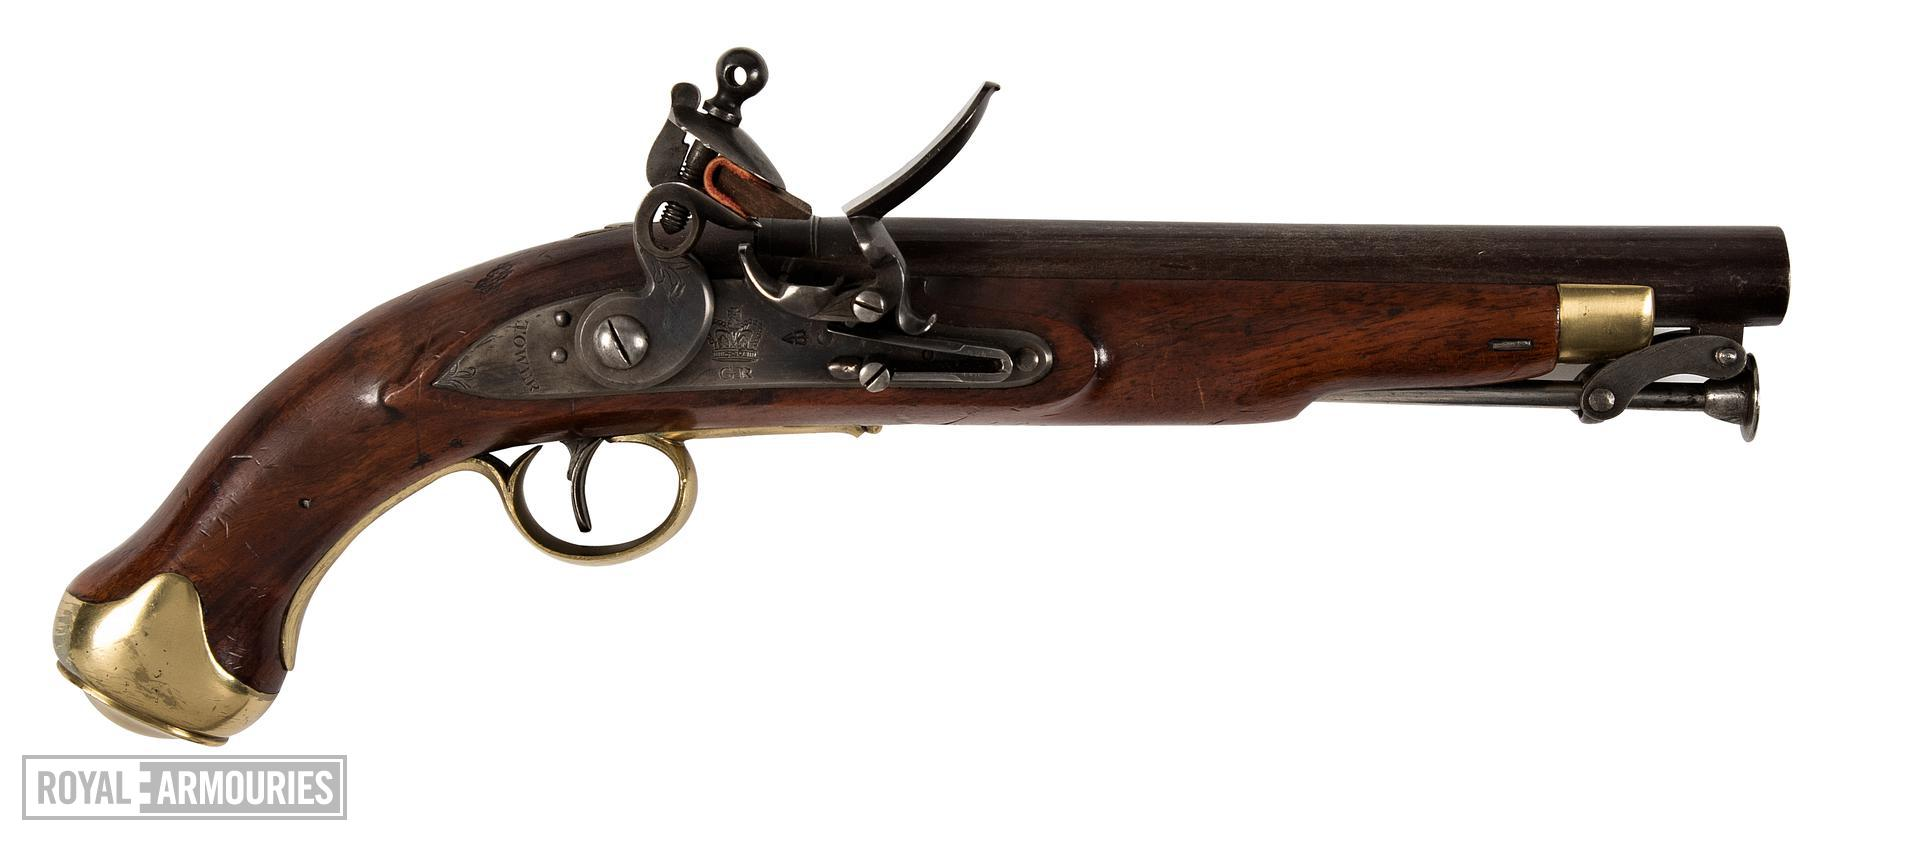 Flintlock muzzle-loading cavalry pistol - New Land Pattern Pistol